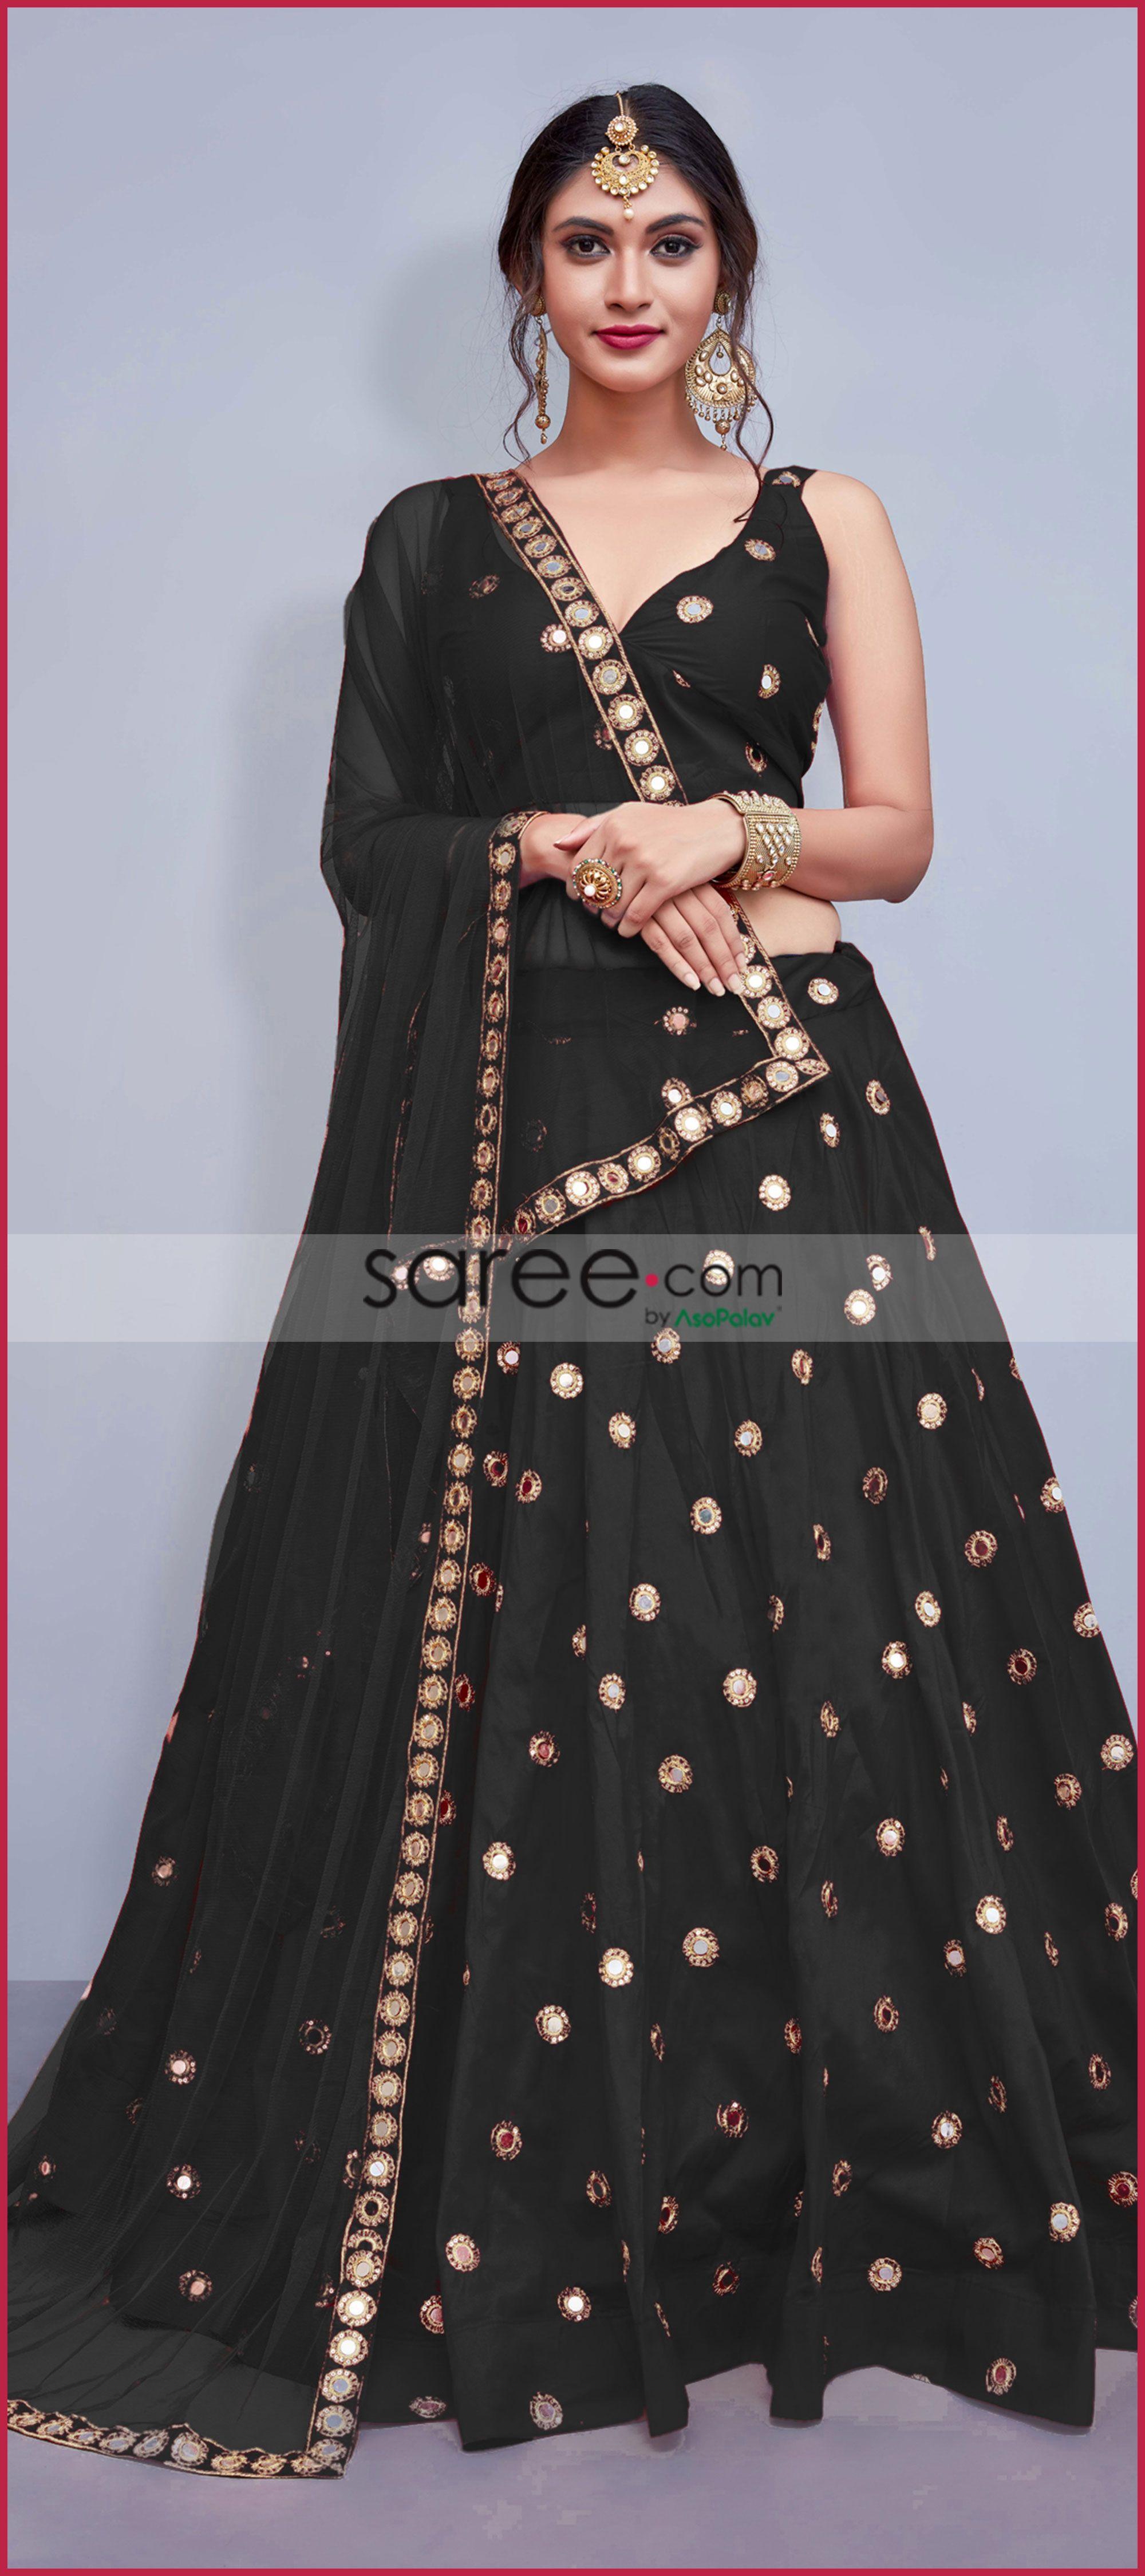 3d996c8db8 Black Taffeta Silk Designer Lehenga Choli With Mirror Work ...